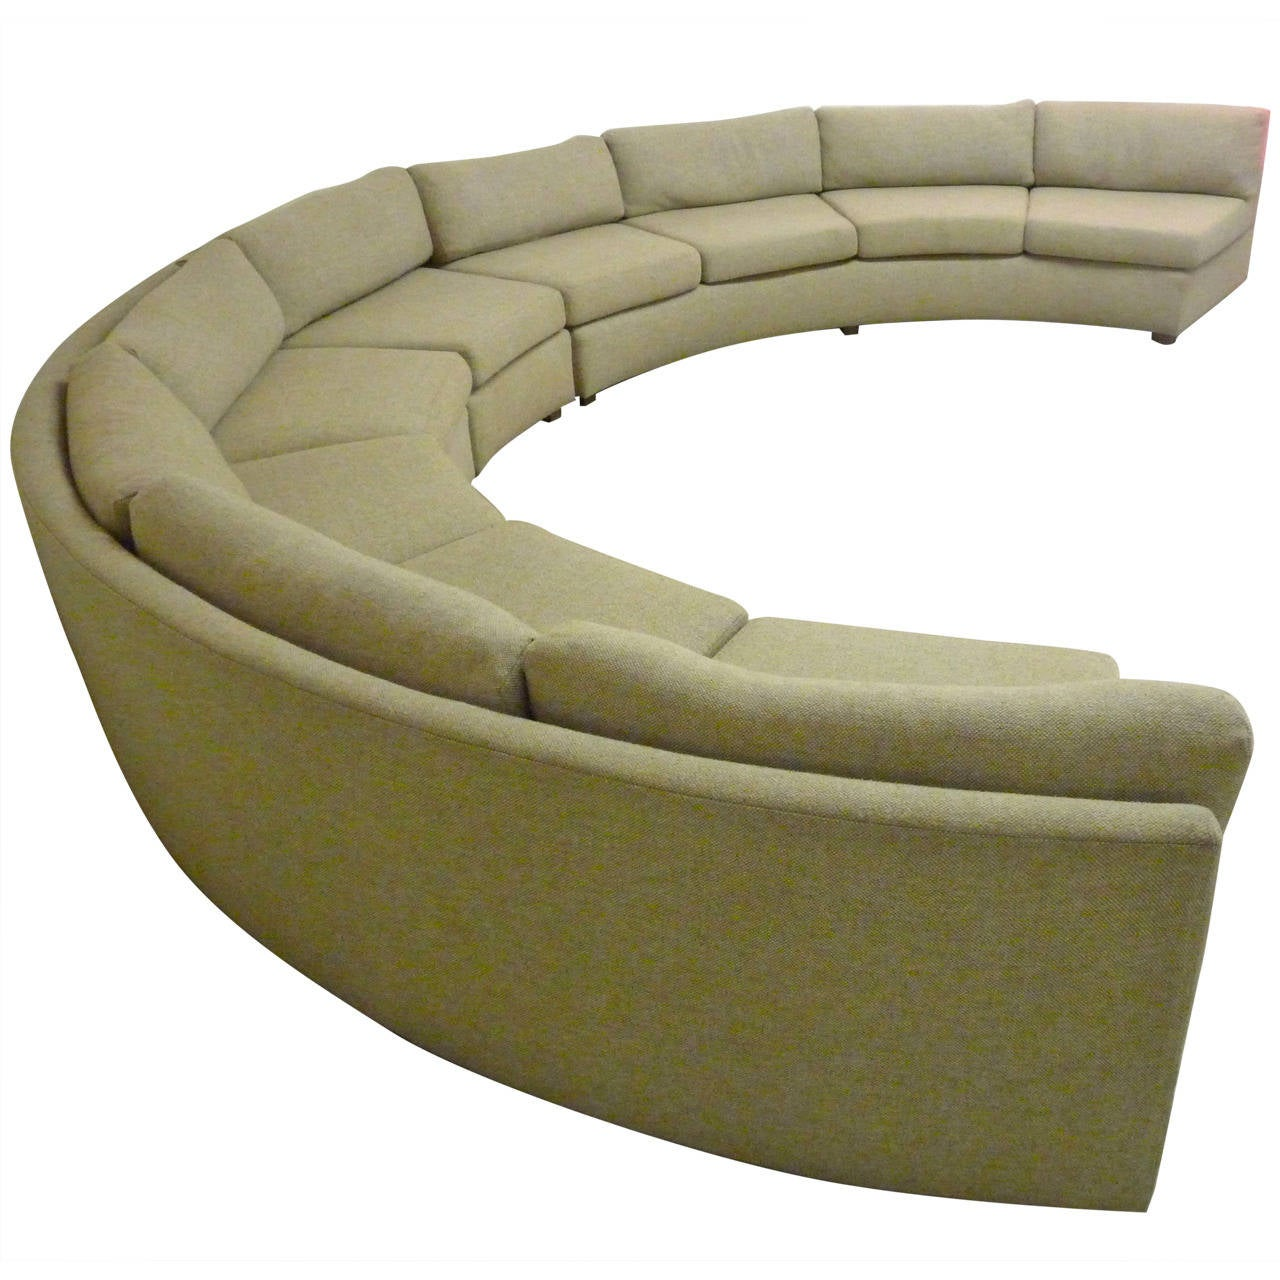 Large, Curved Milo Baughman Sectional Sofa At 1stdibs